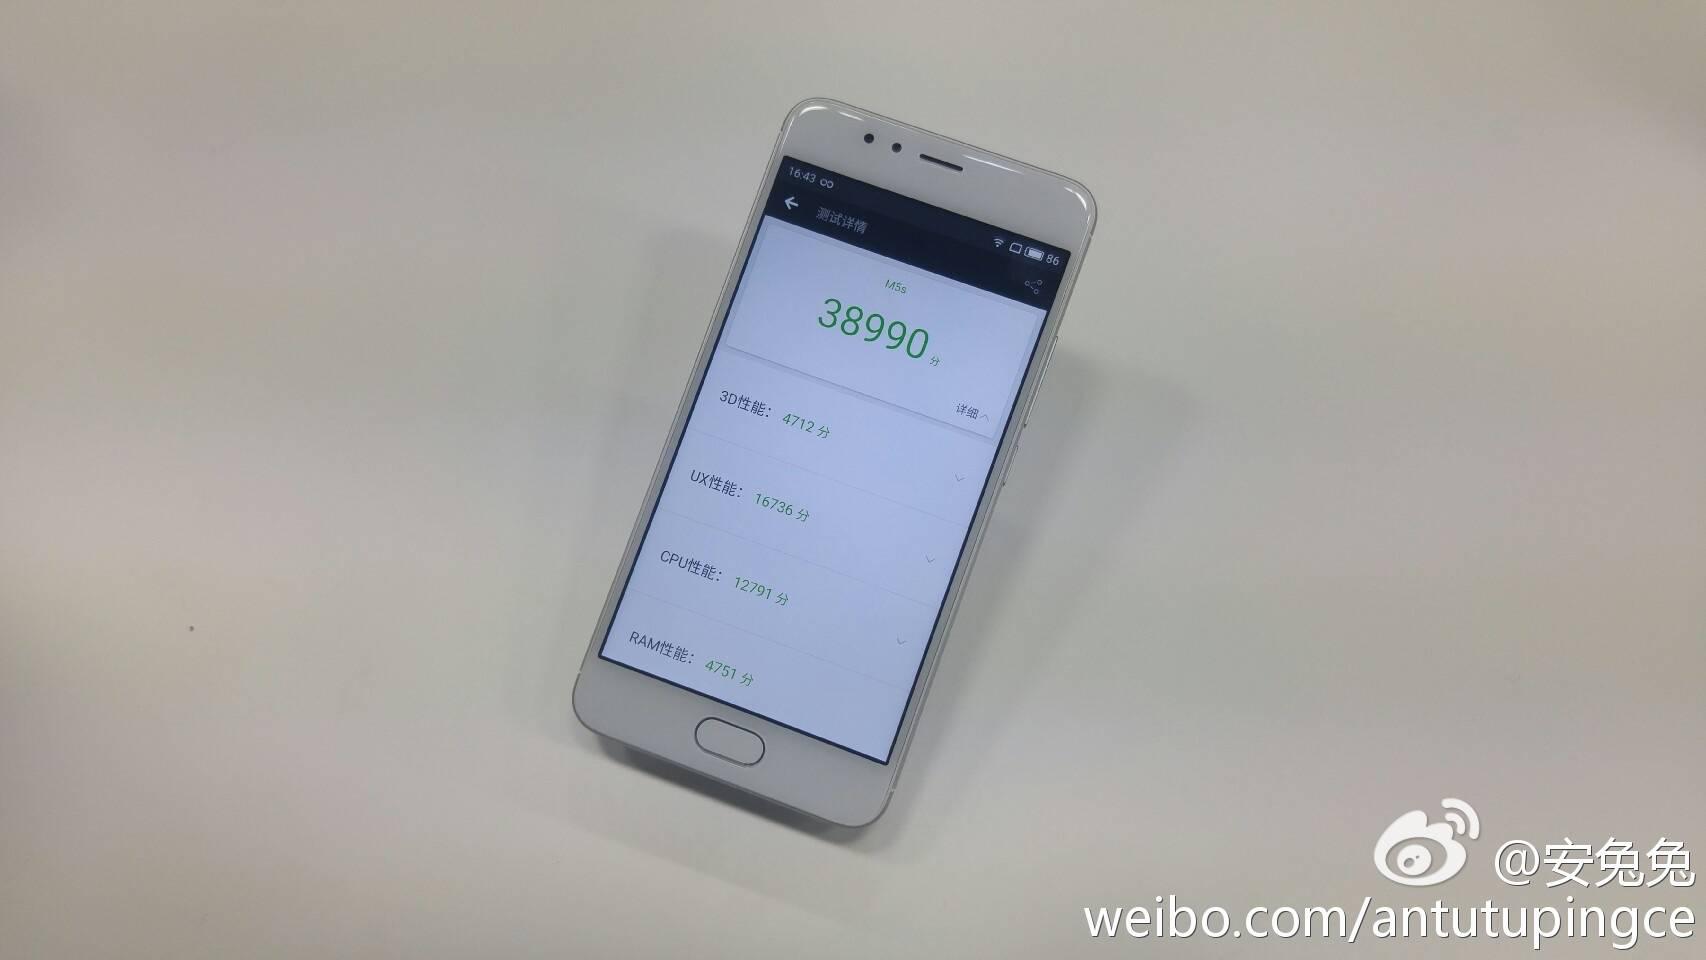 Antutu公式がMeizu M5sのベンチマーク結果を公開。これは本当に2017年のスマートフォンですか?